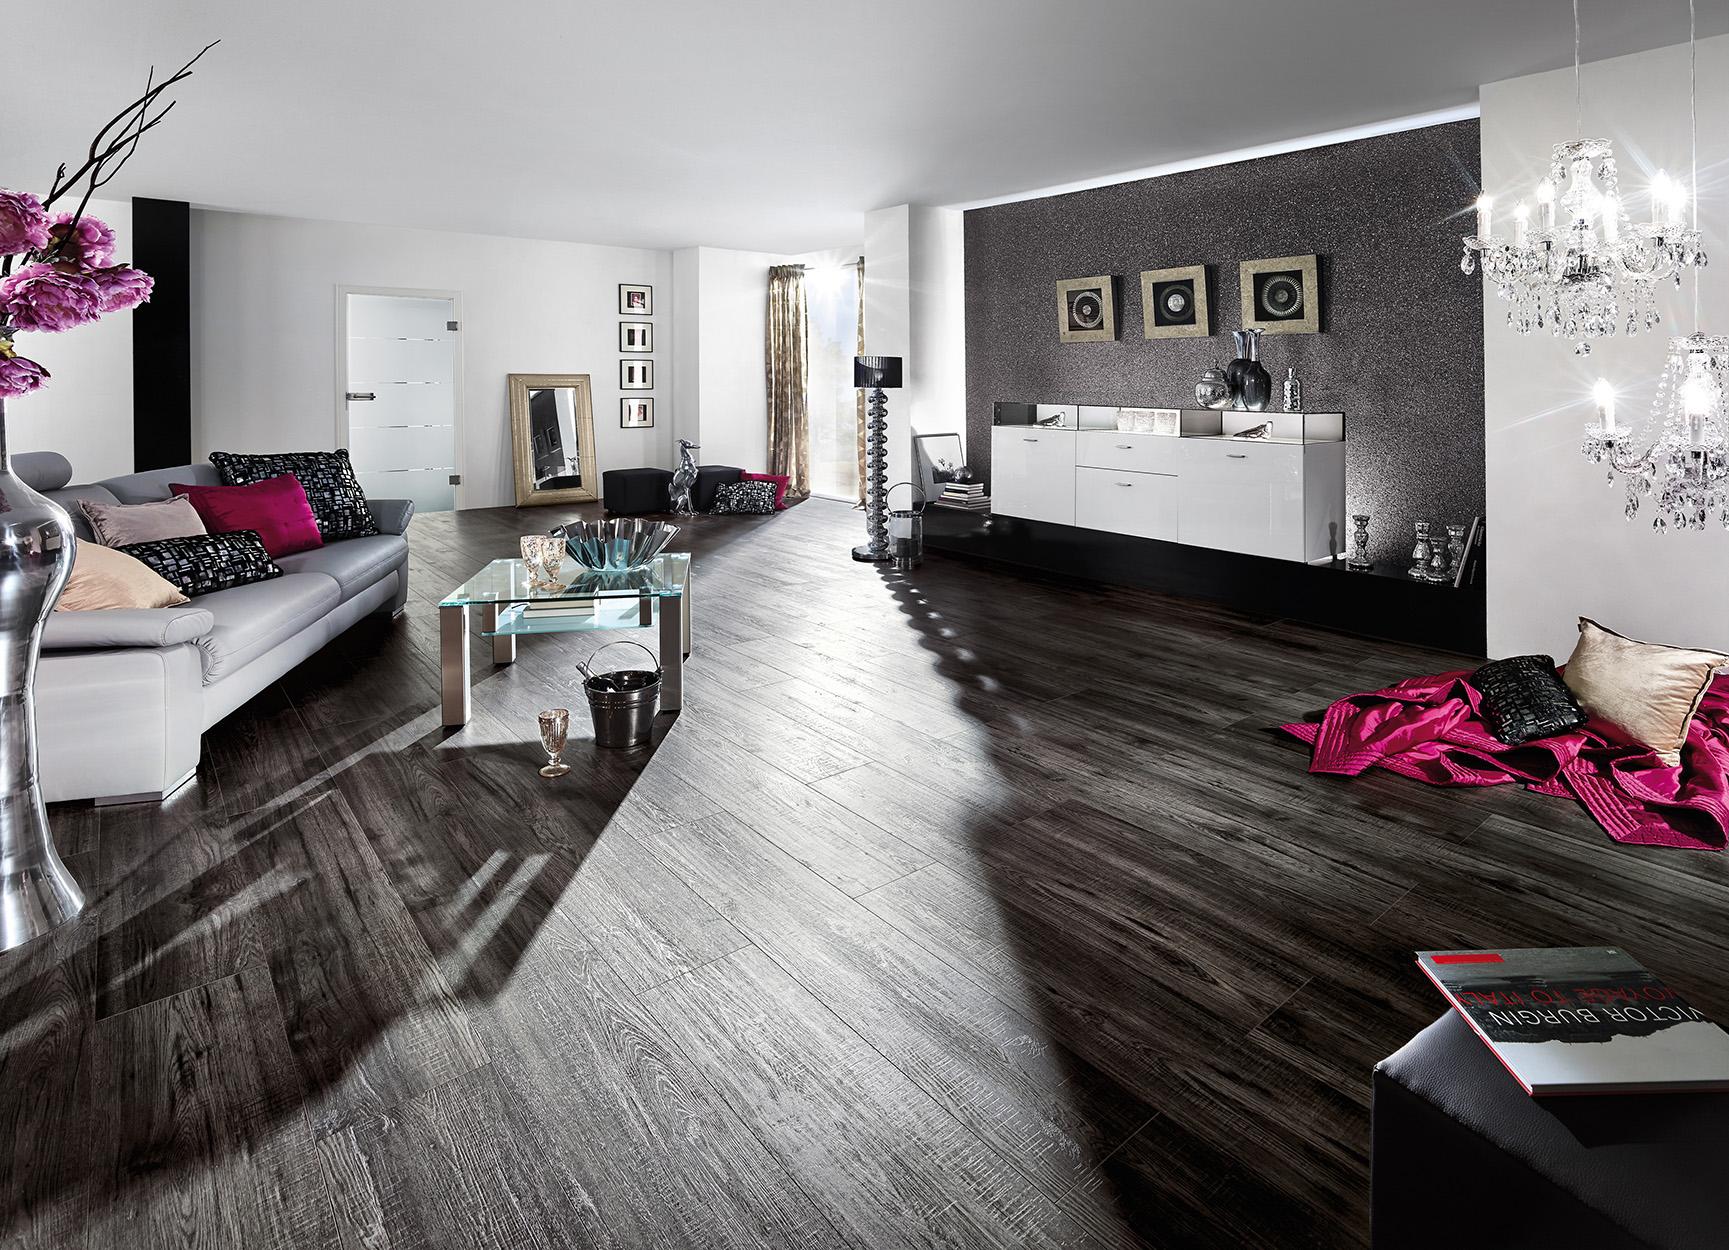 cker fussb den leistungen. Black Bedroom Furniture Sets. Home Design Ideas